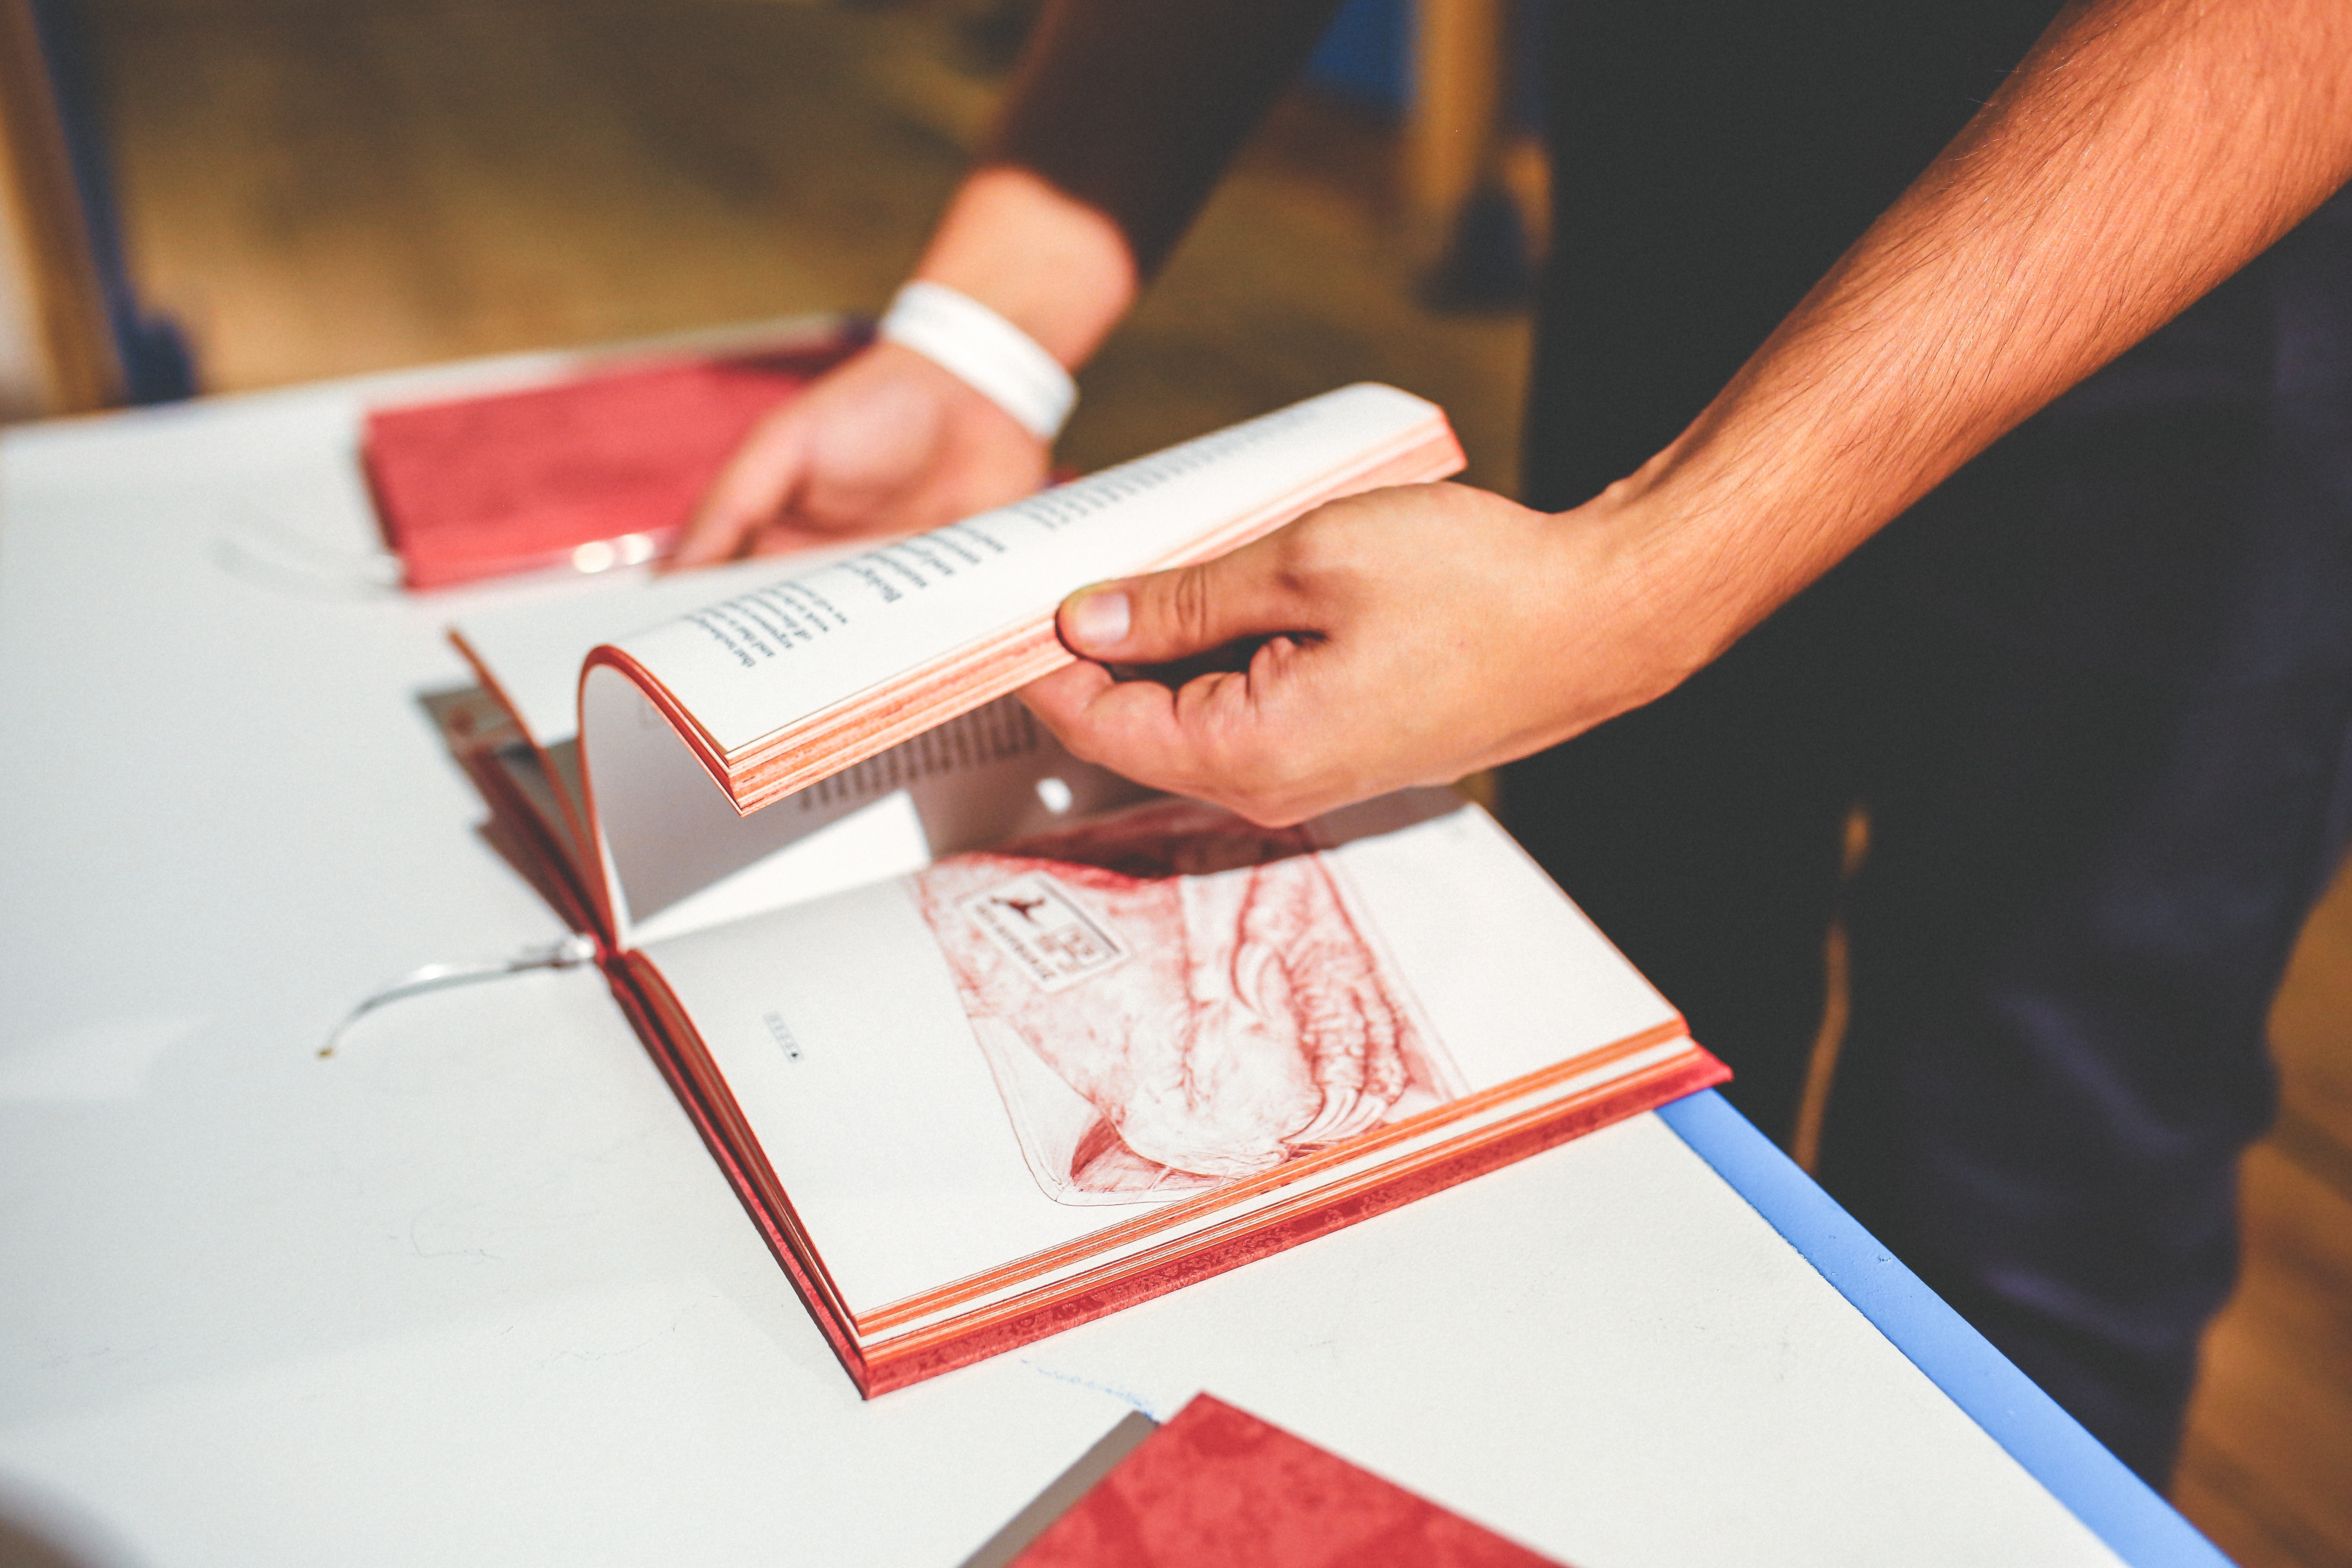 Book in men's hands, Paper, Pages, Men, Pencil, HQ Photo